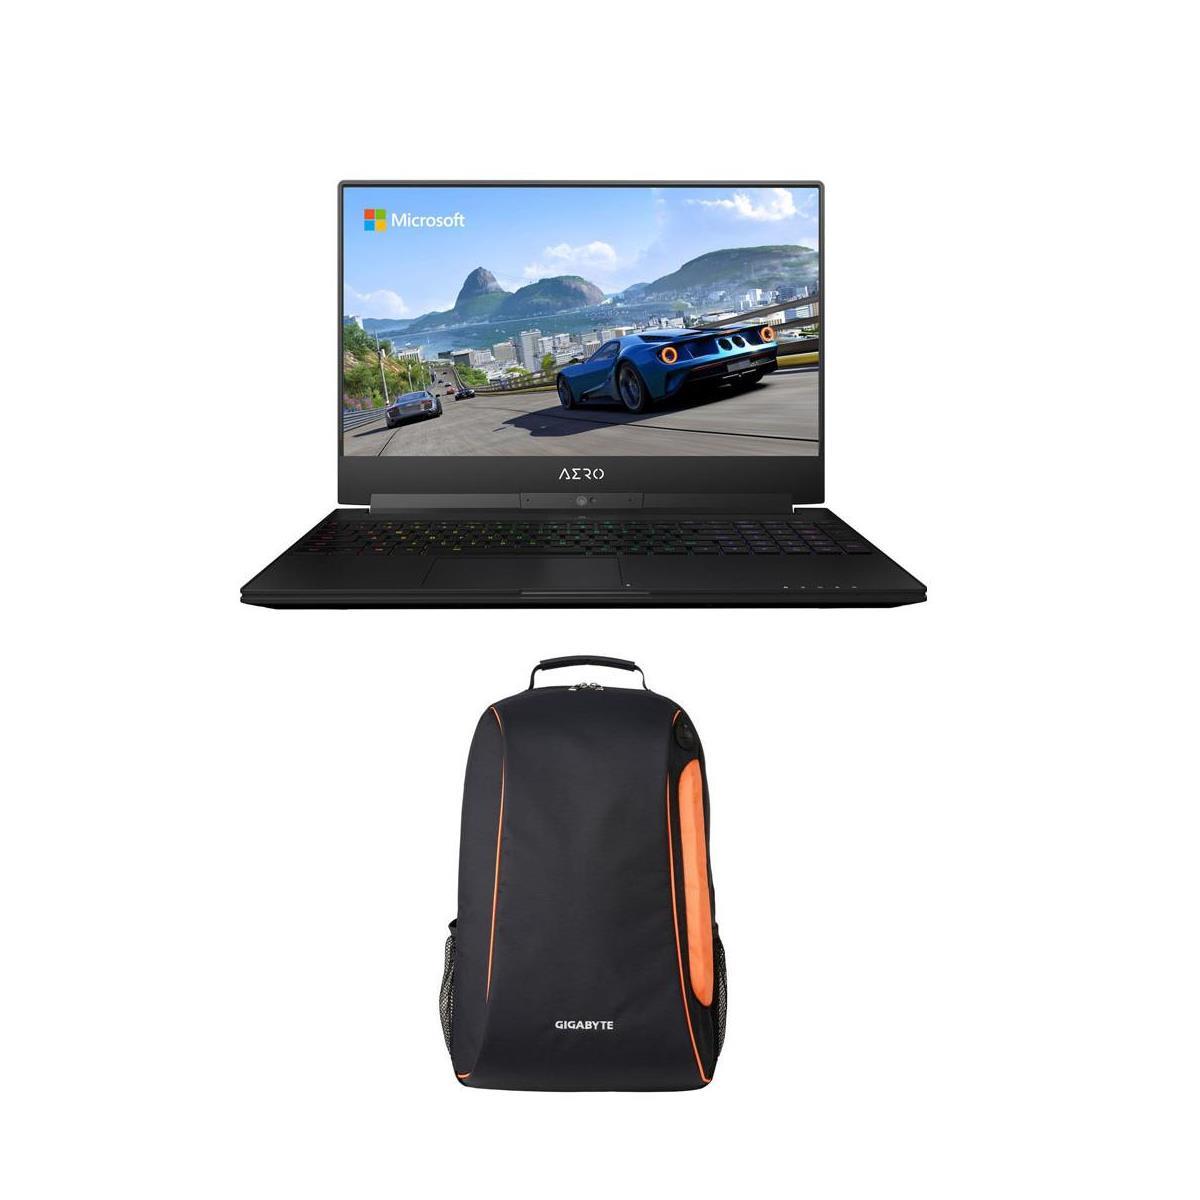 825e115a33e eBay App  Gigabyte Aero 15X Laptop  1080p 144Hz, i7-8750H, GTX 1070 ...